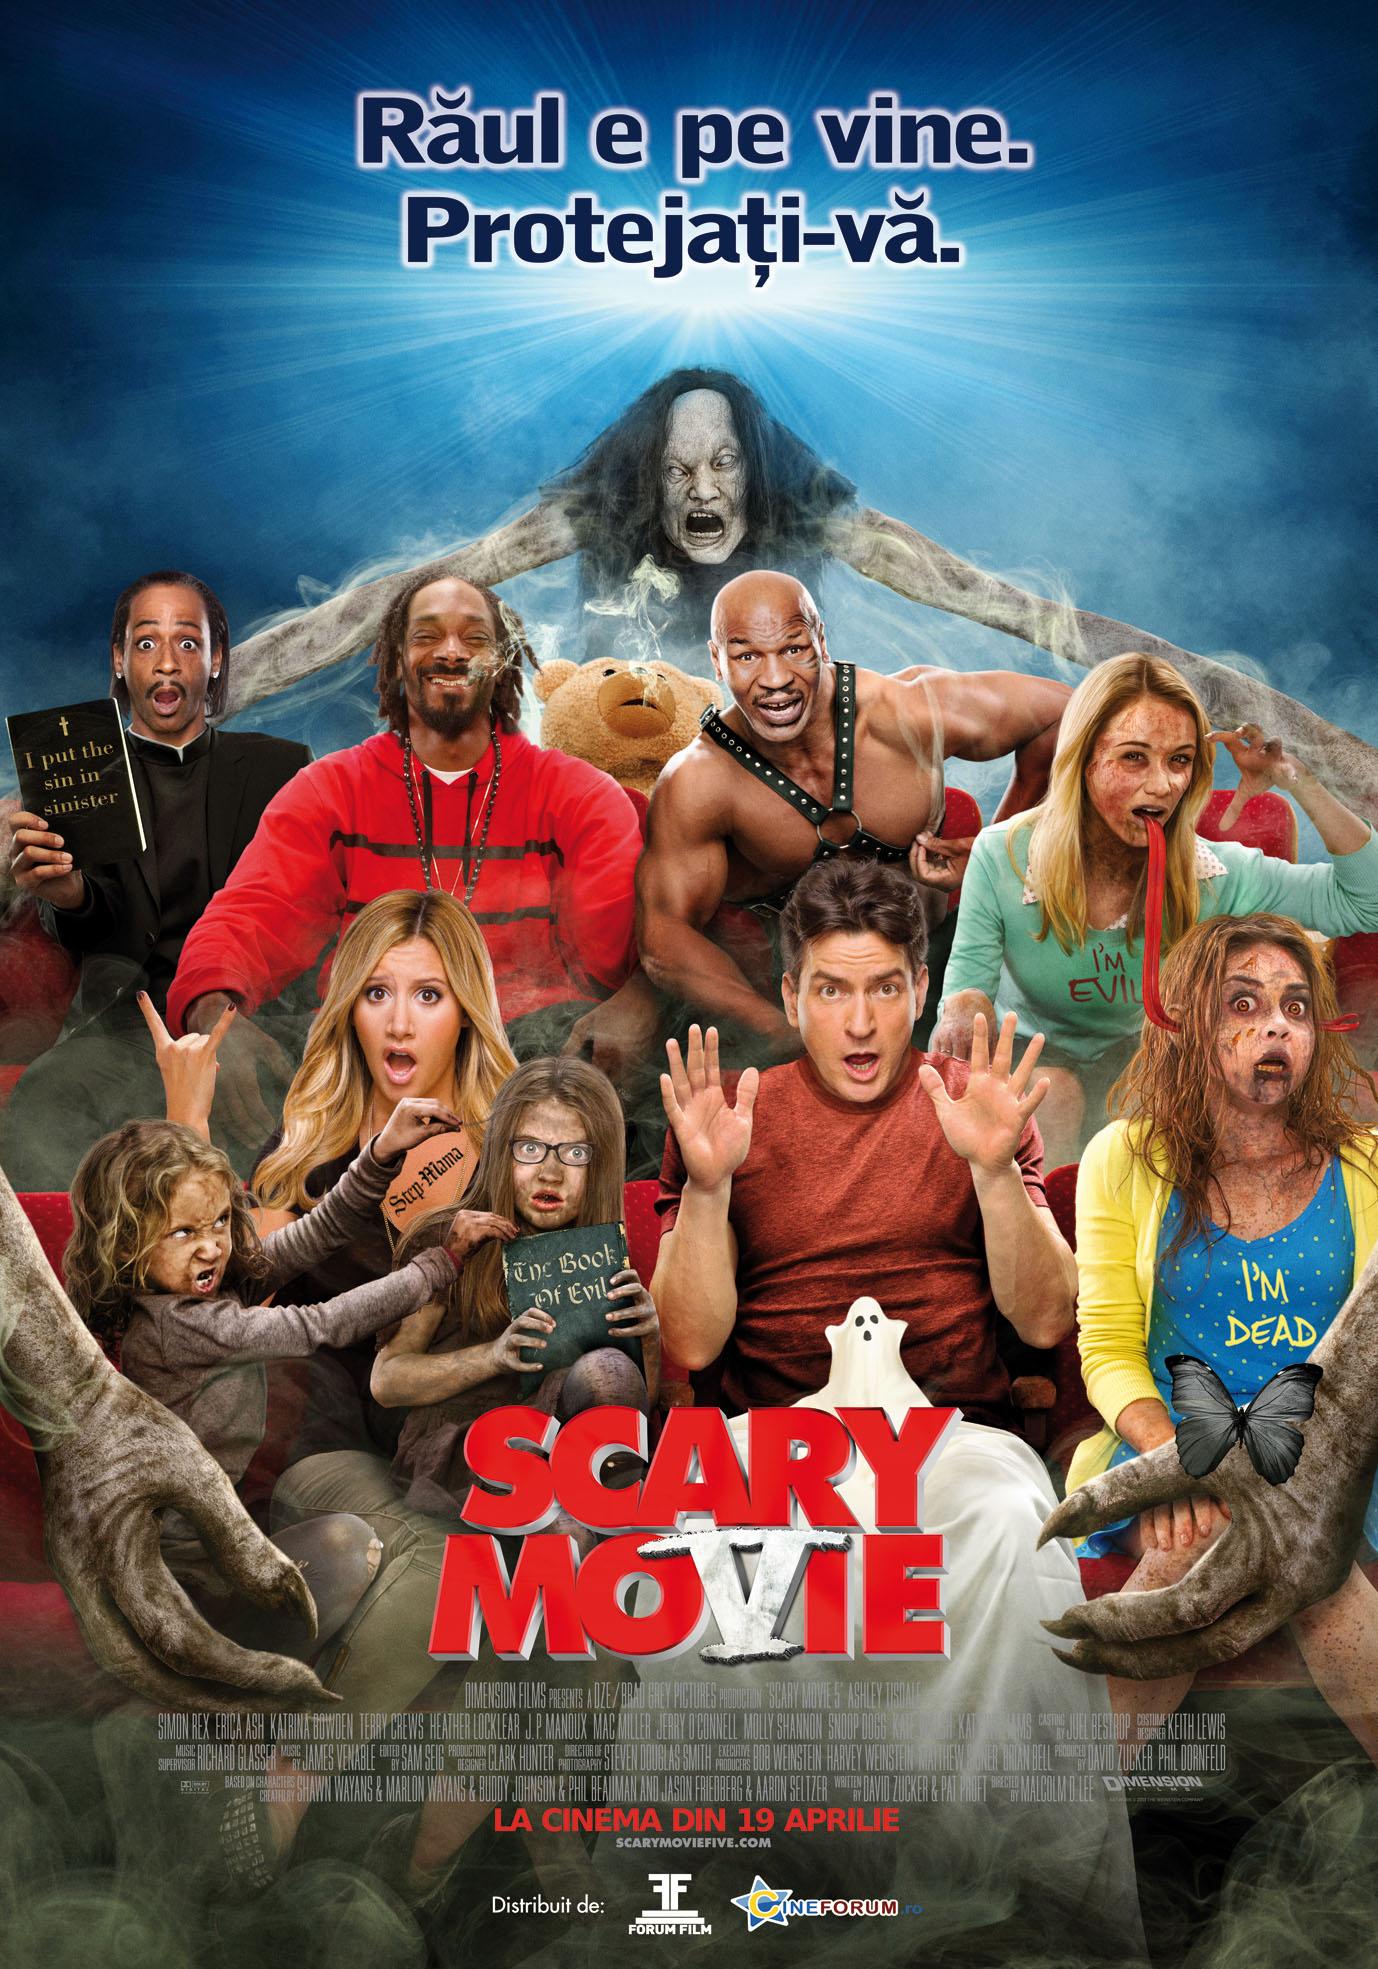 Scary Movie 5 Comedie De Groază 5 2013 Film Cinemagia Ro